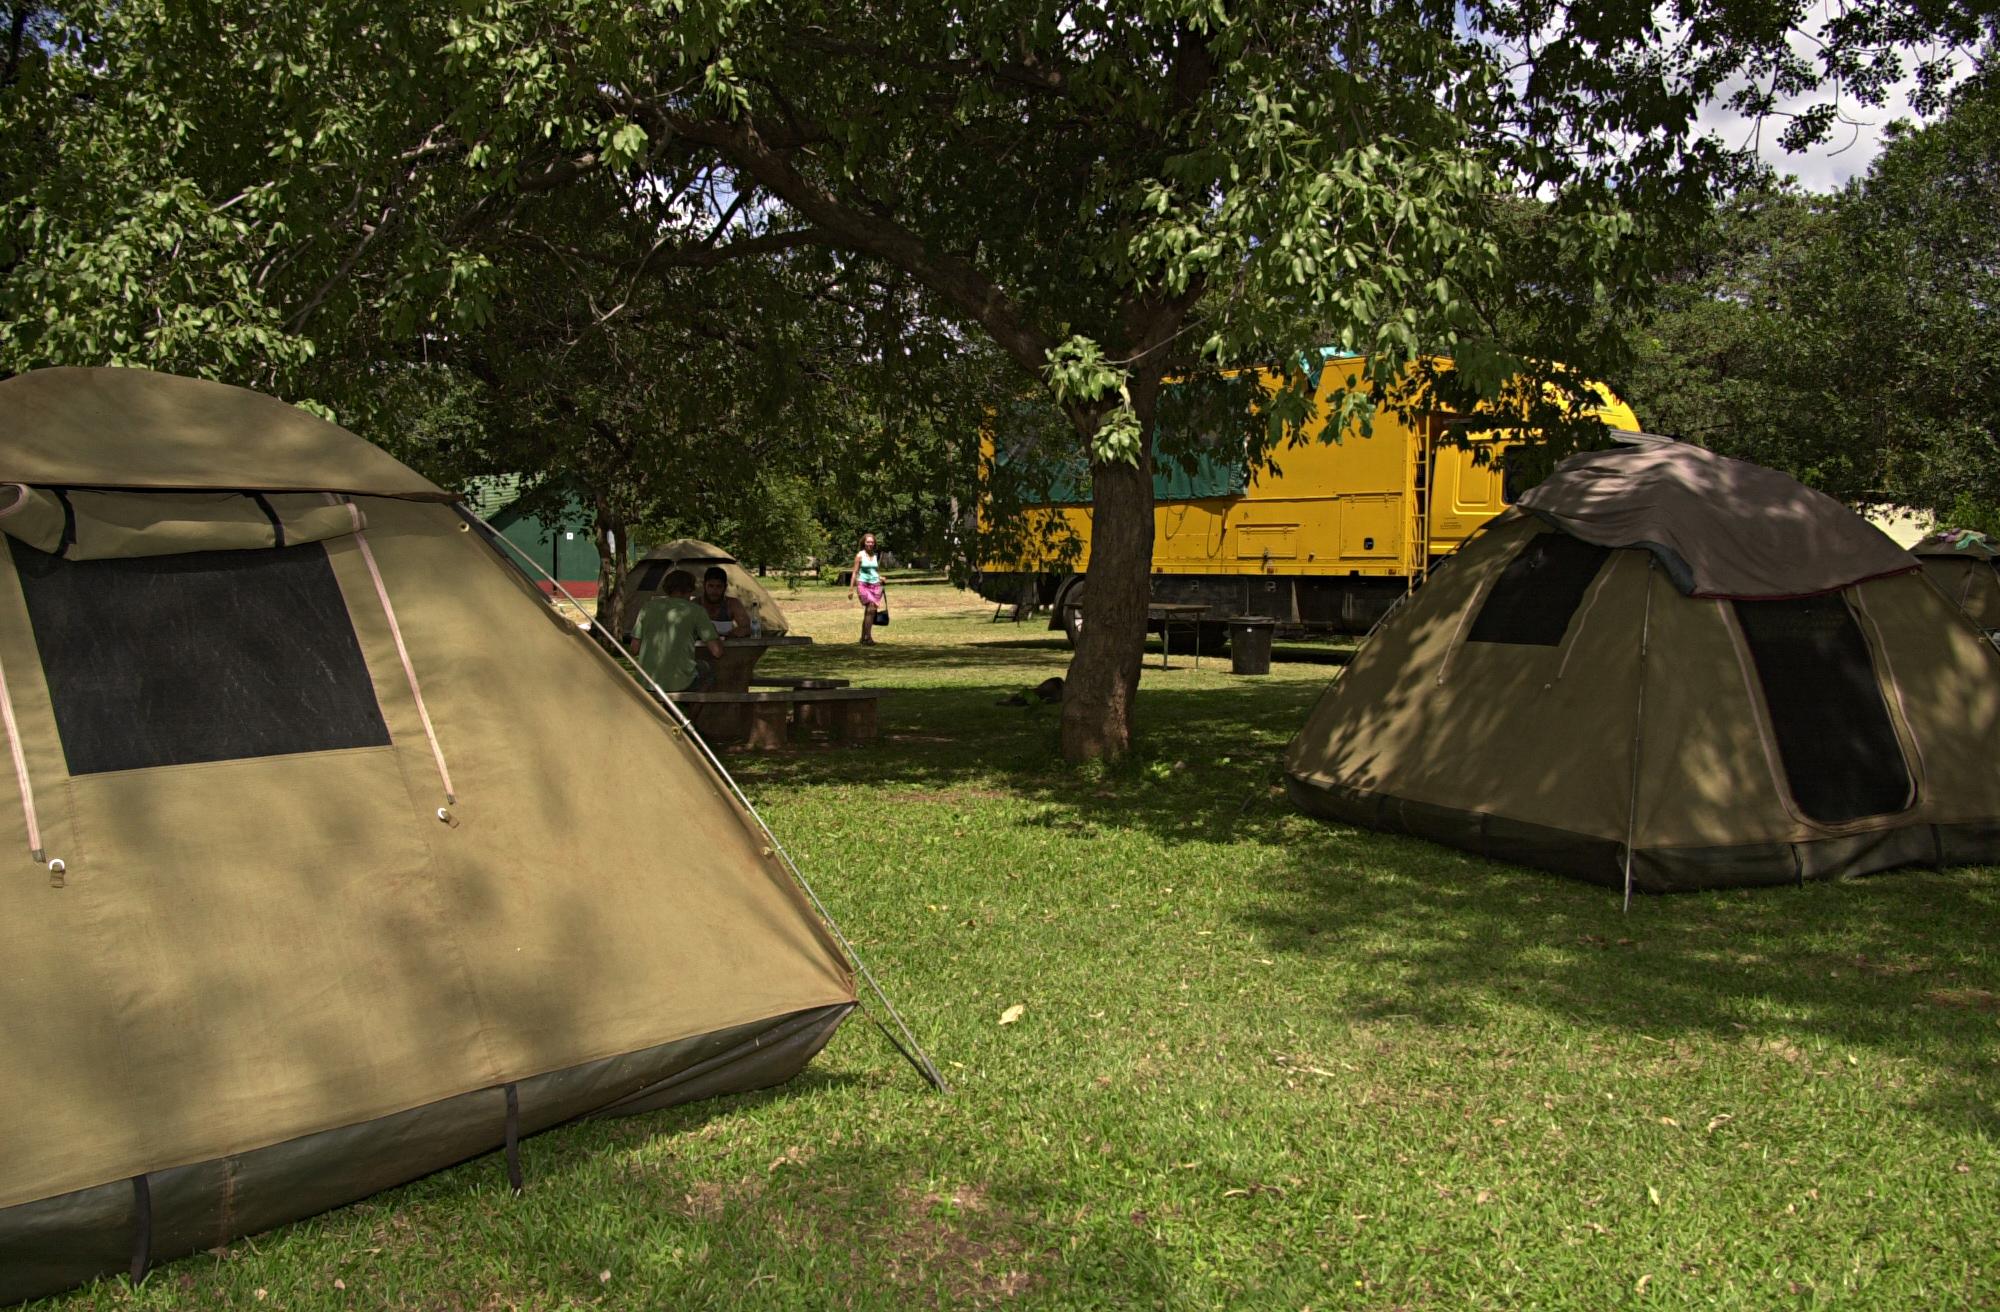 Victoria Falls Rest Camp And Lodges, Hwange